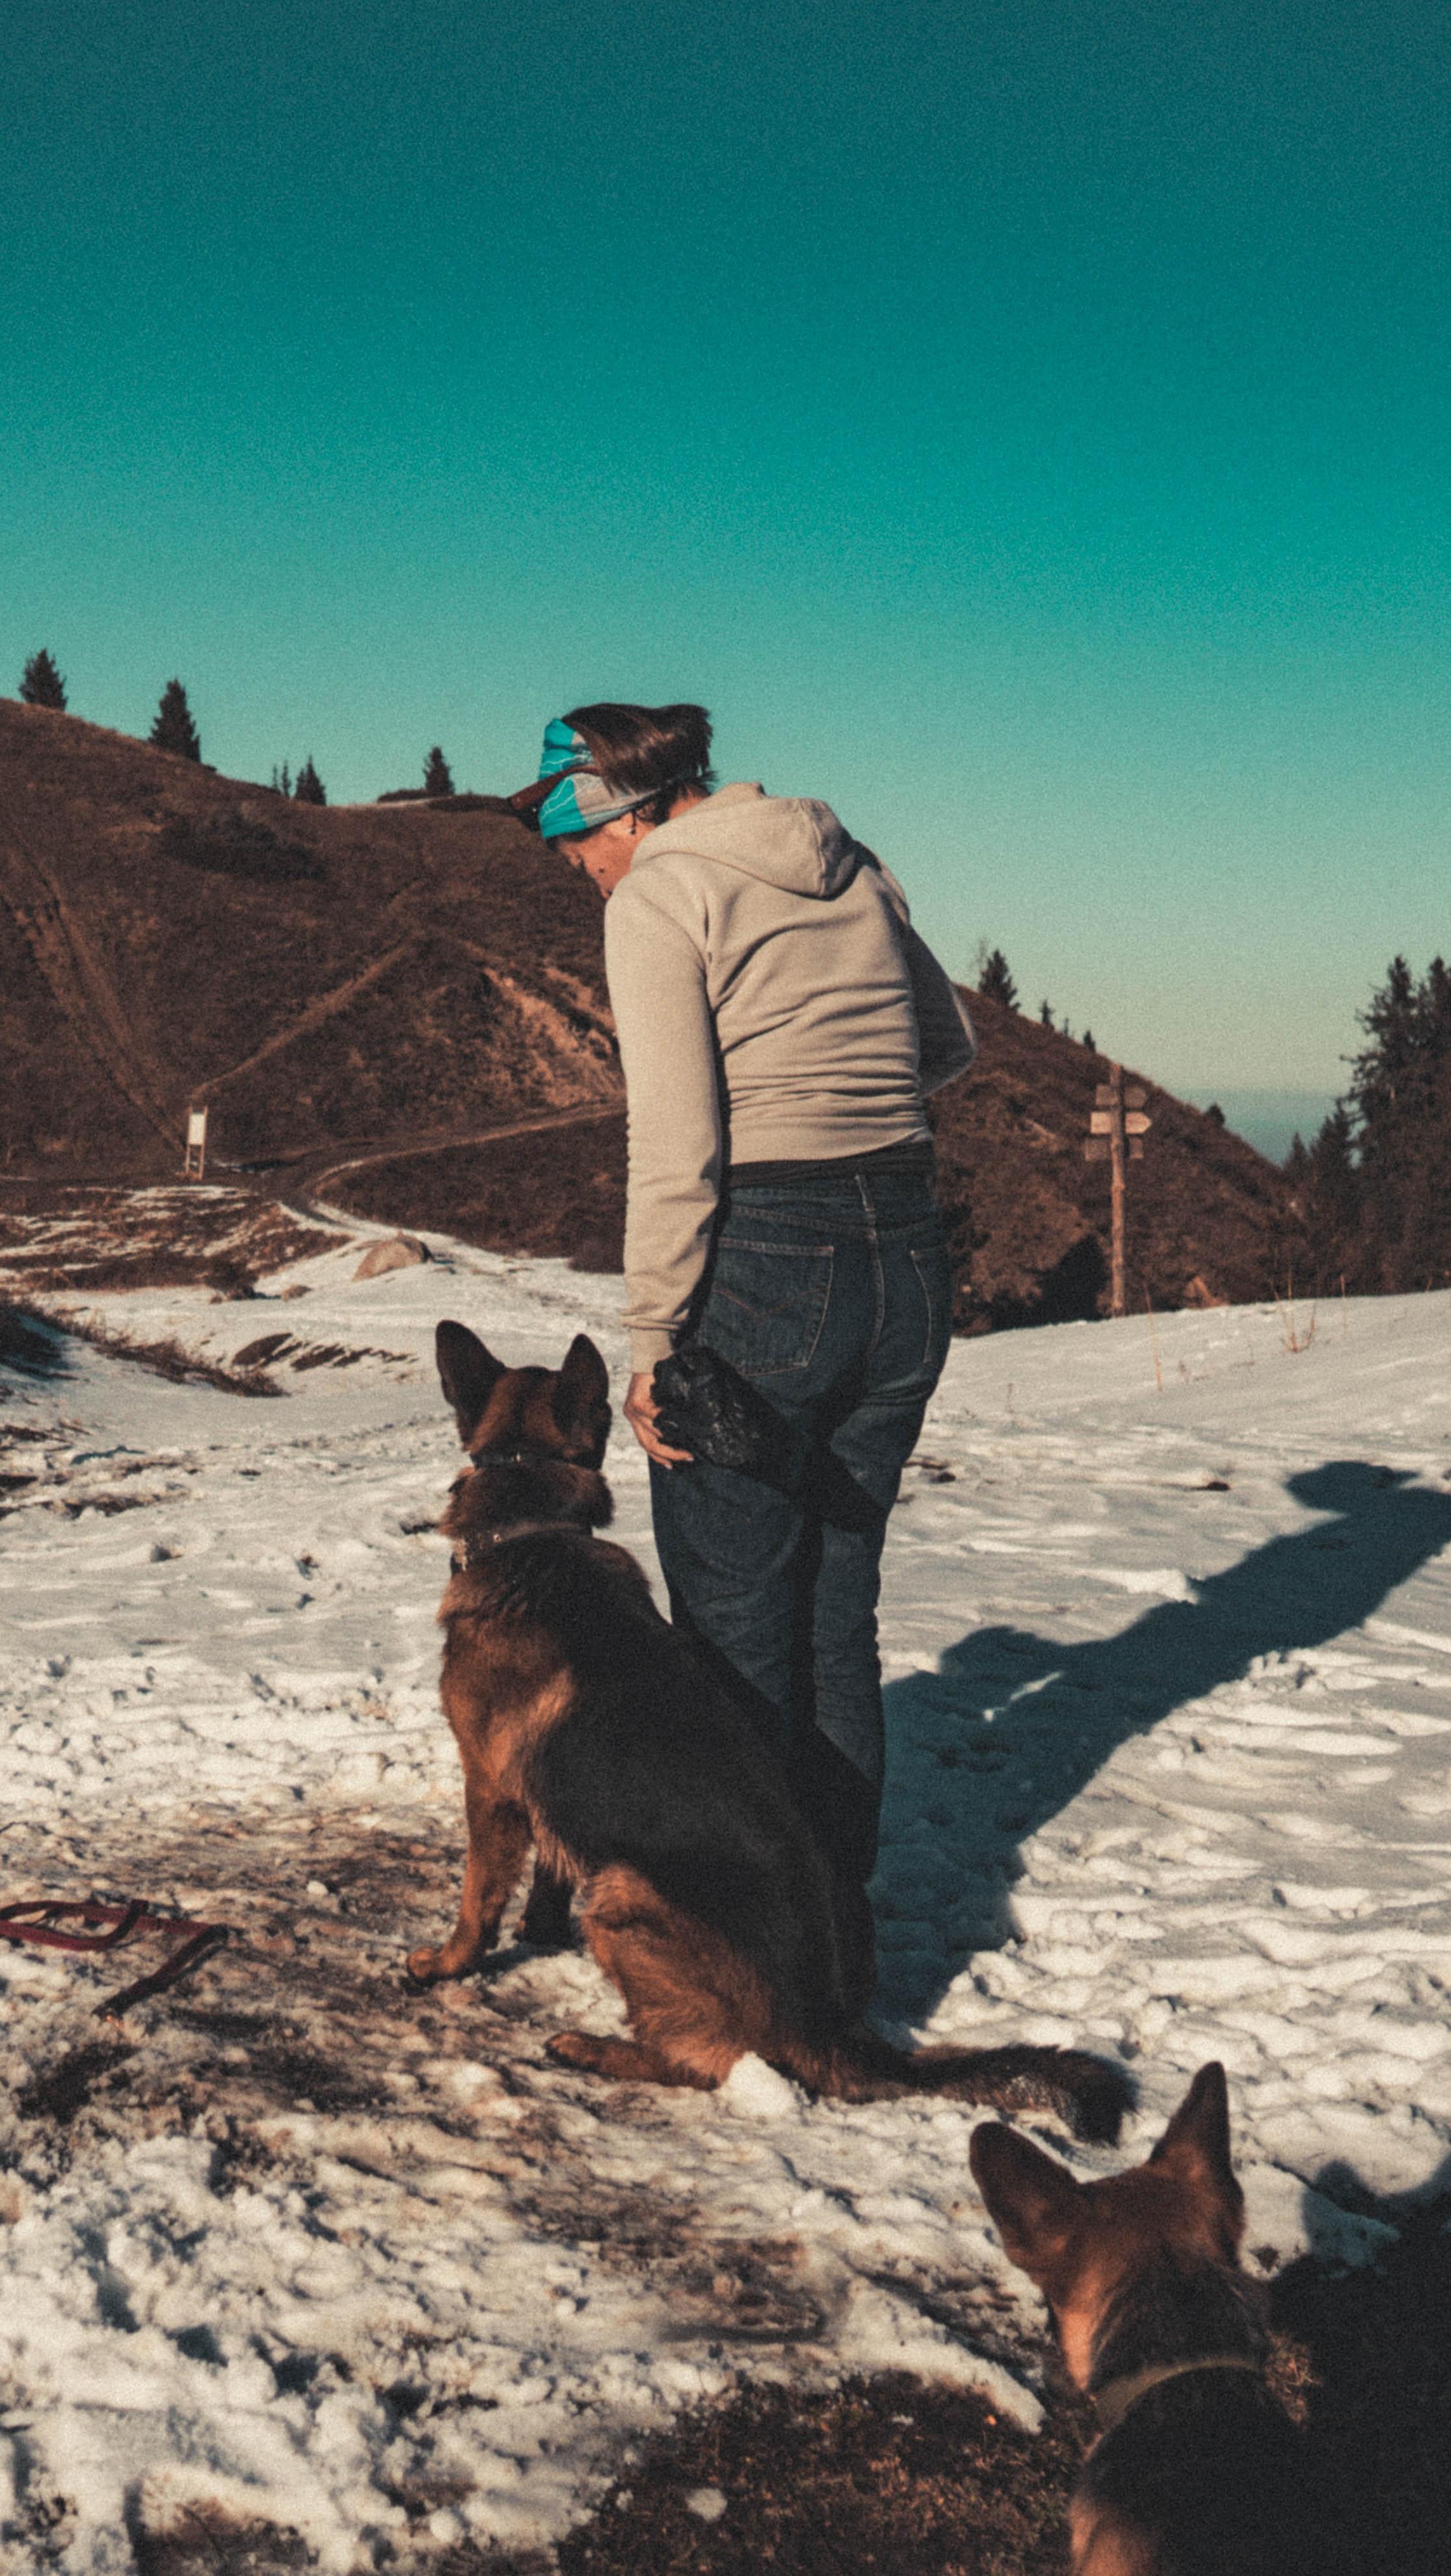 German shepherd looking at landscape stock photo download image.